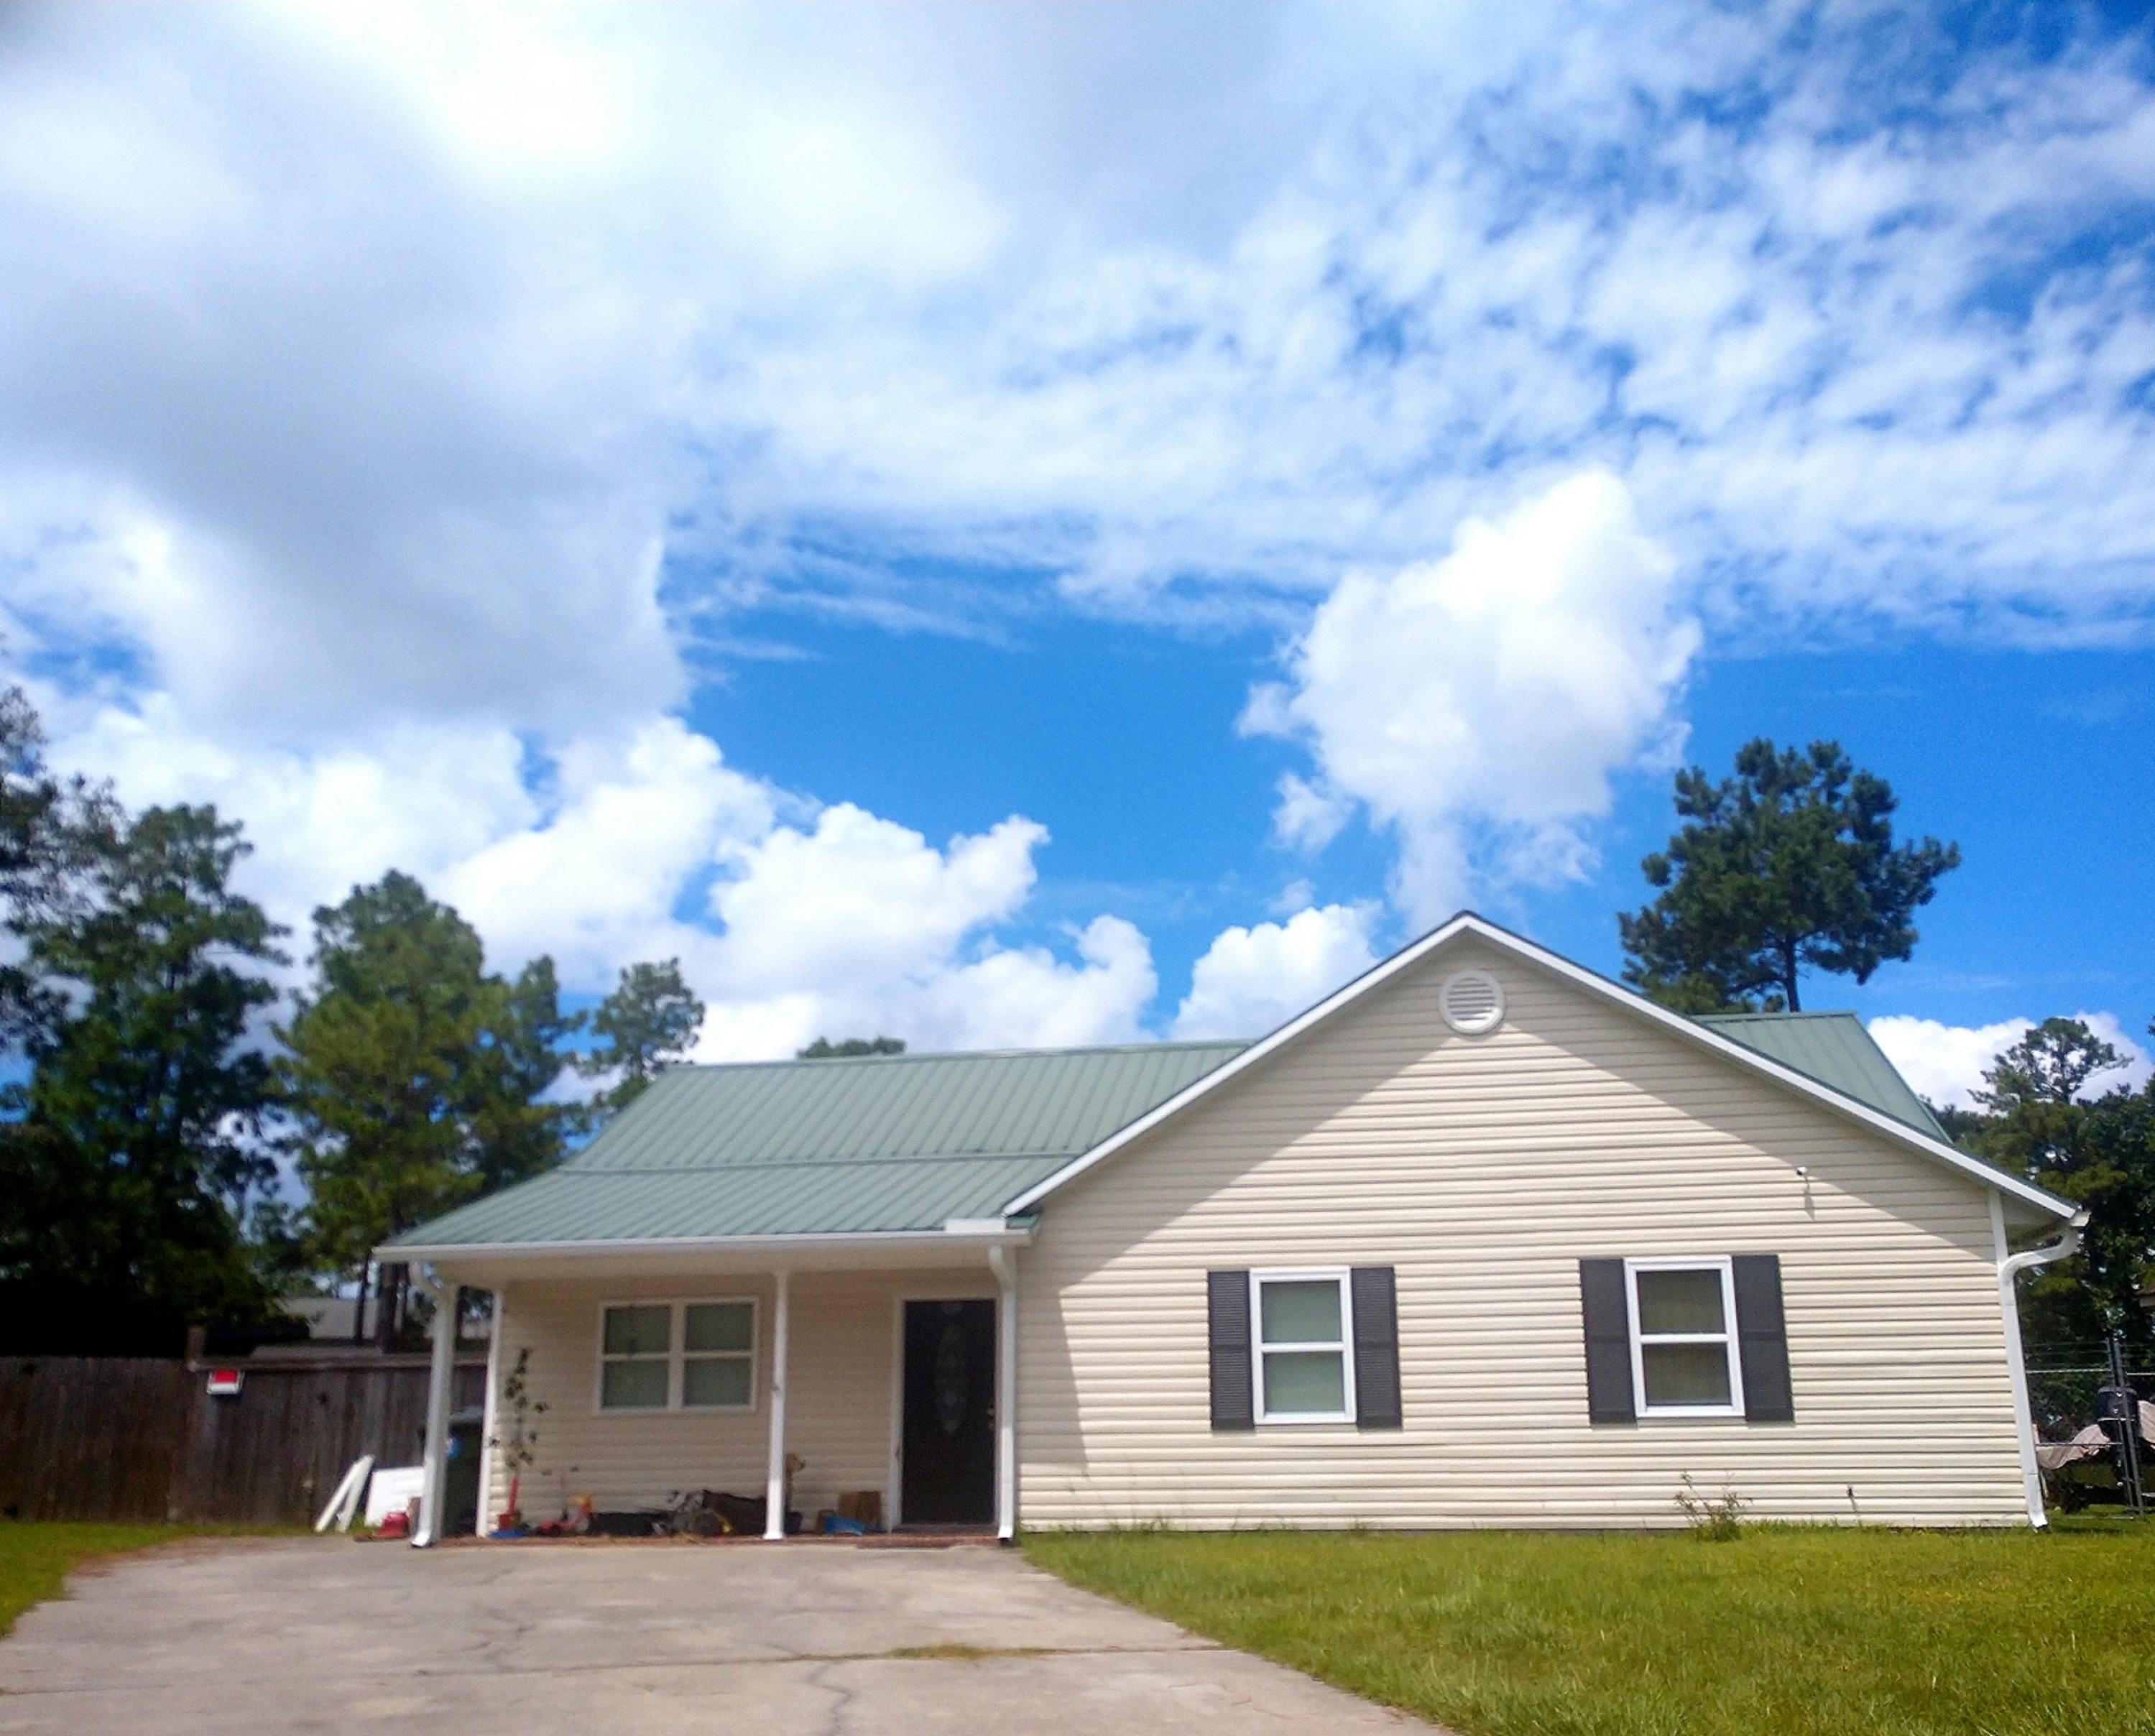 109 Broken Trail Summerville, SC 29483